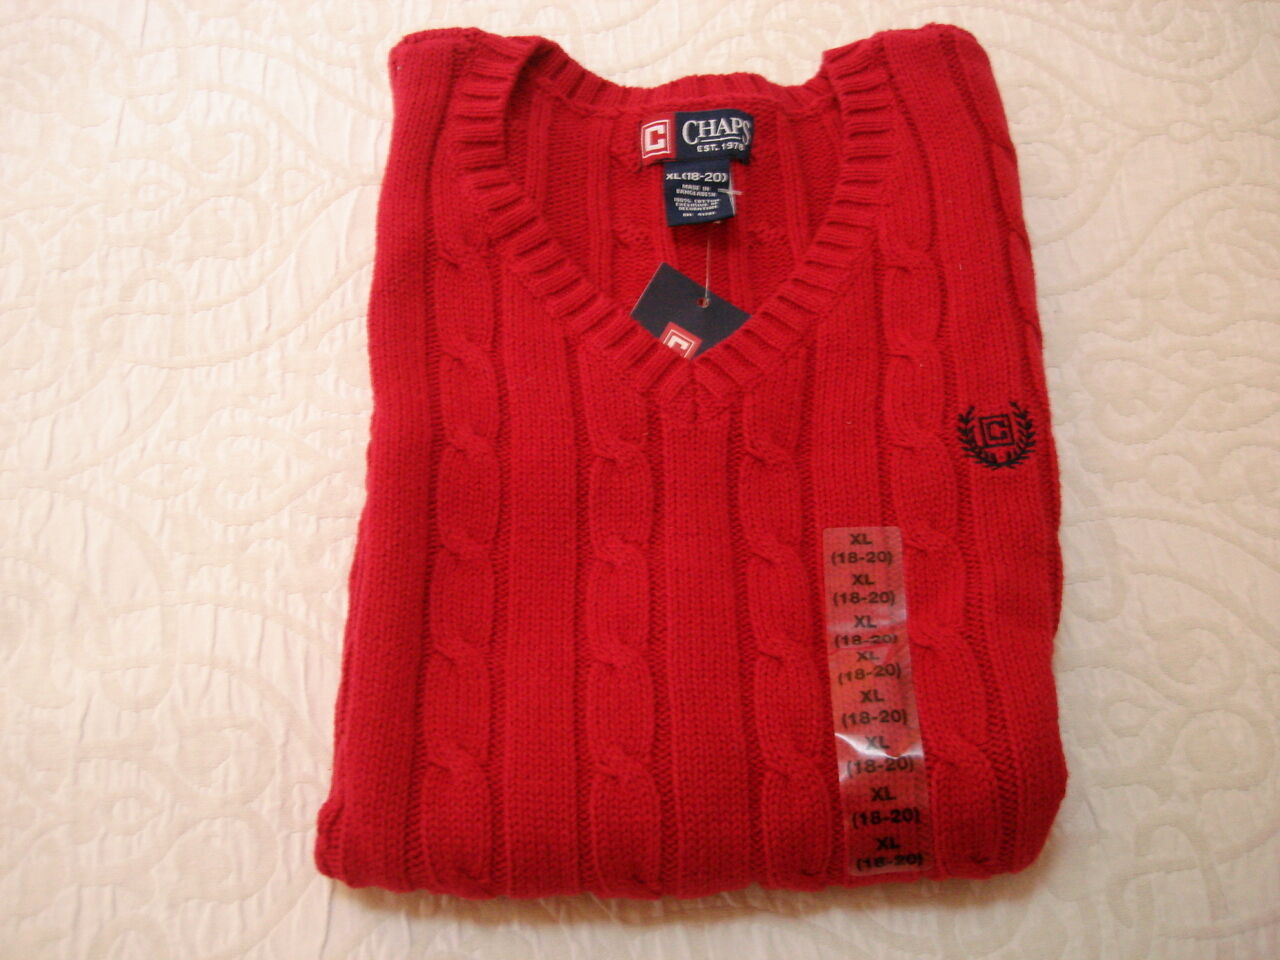 Ralph Lauren Chaps Red Sweater Vest Boys Sz XL 18 / 20 | eBay